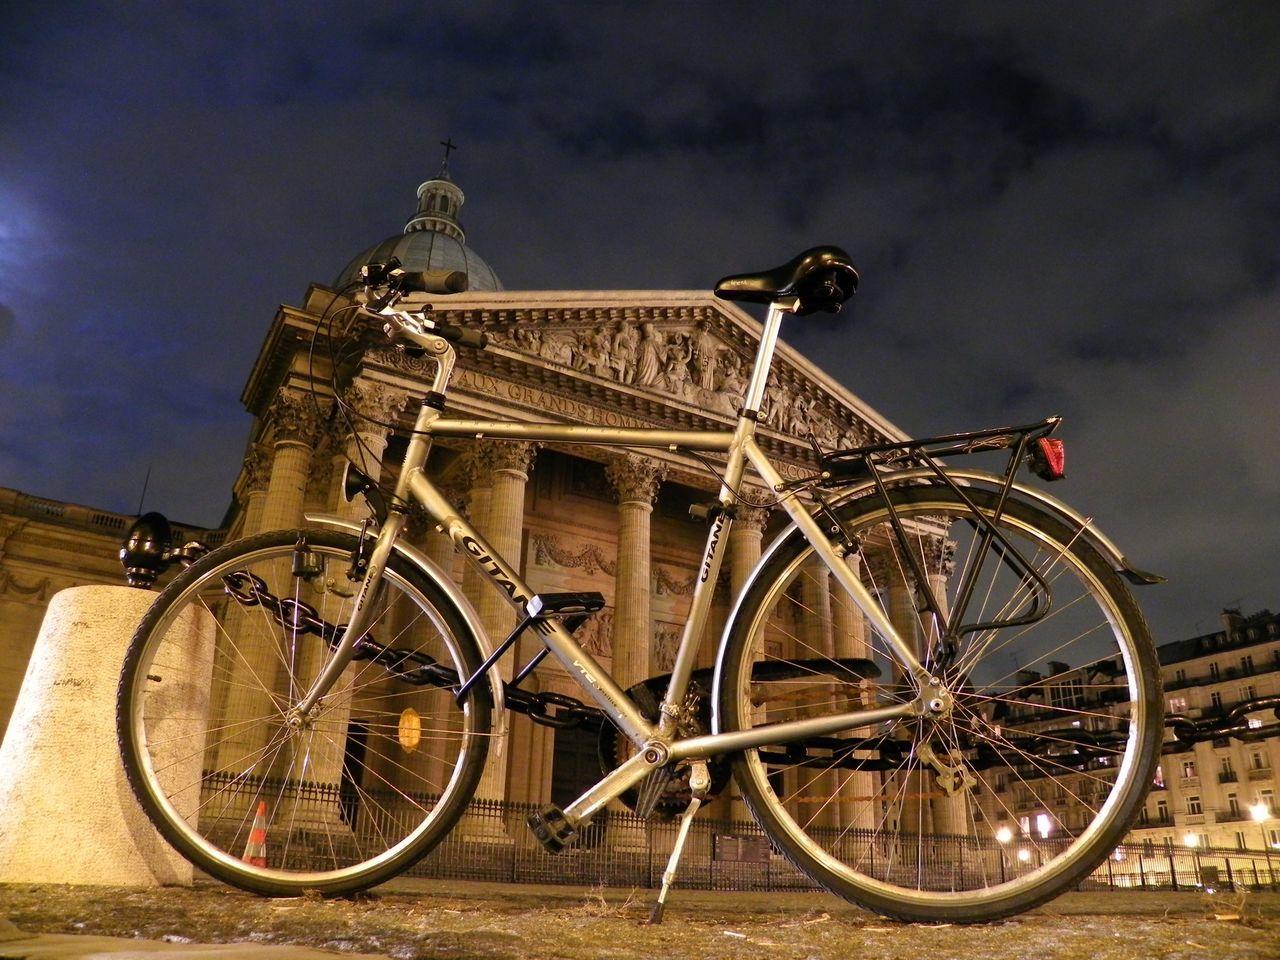 Oldpicture Street Photography Paris EloediLo Tadaa Community EyeEm Best Shots Paris By Night Paris Mon Amour Urban Exploration Bike